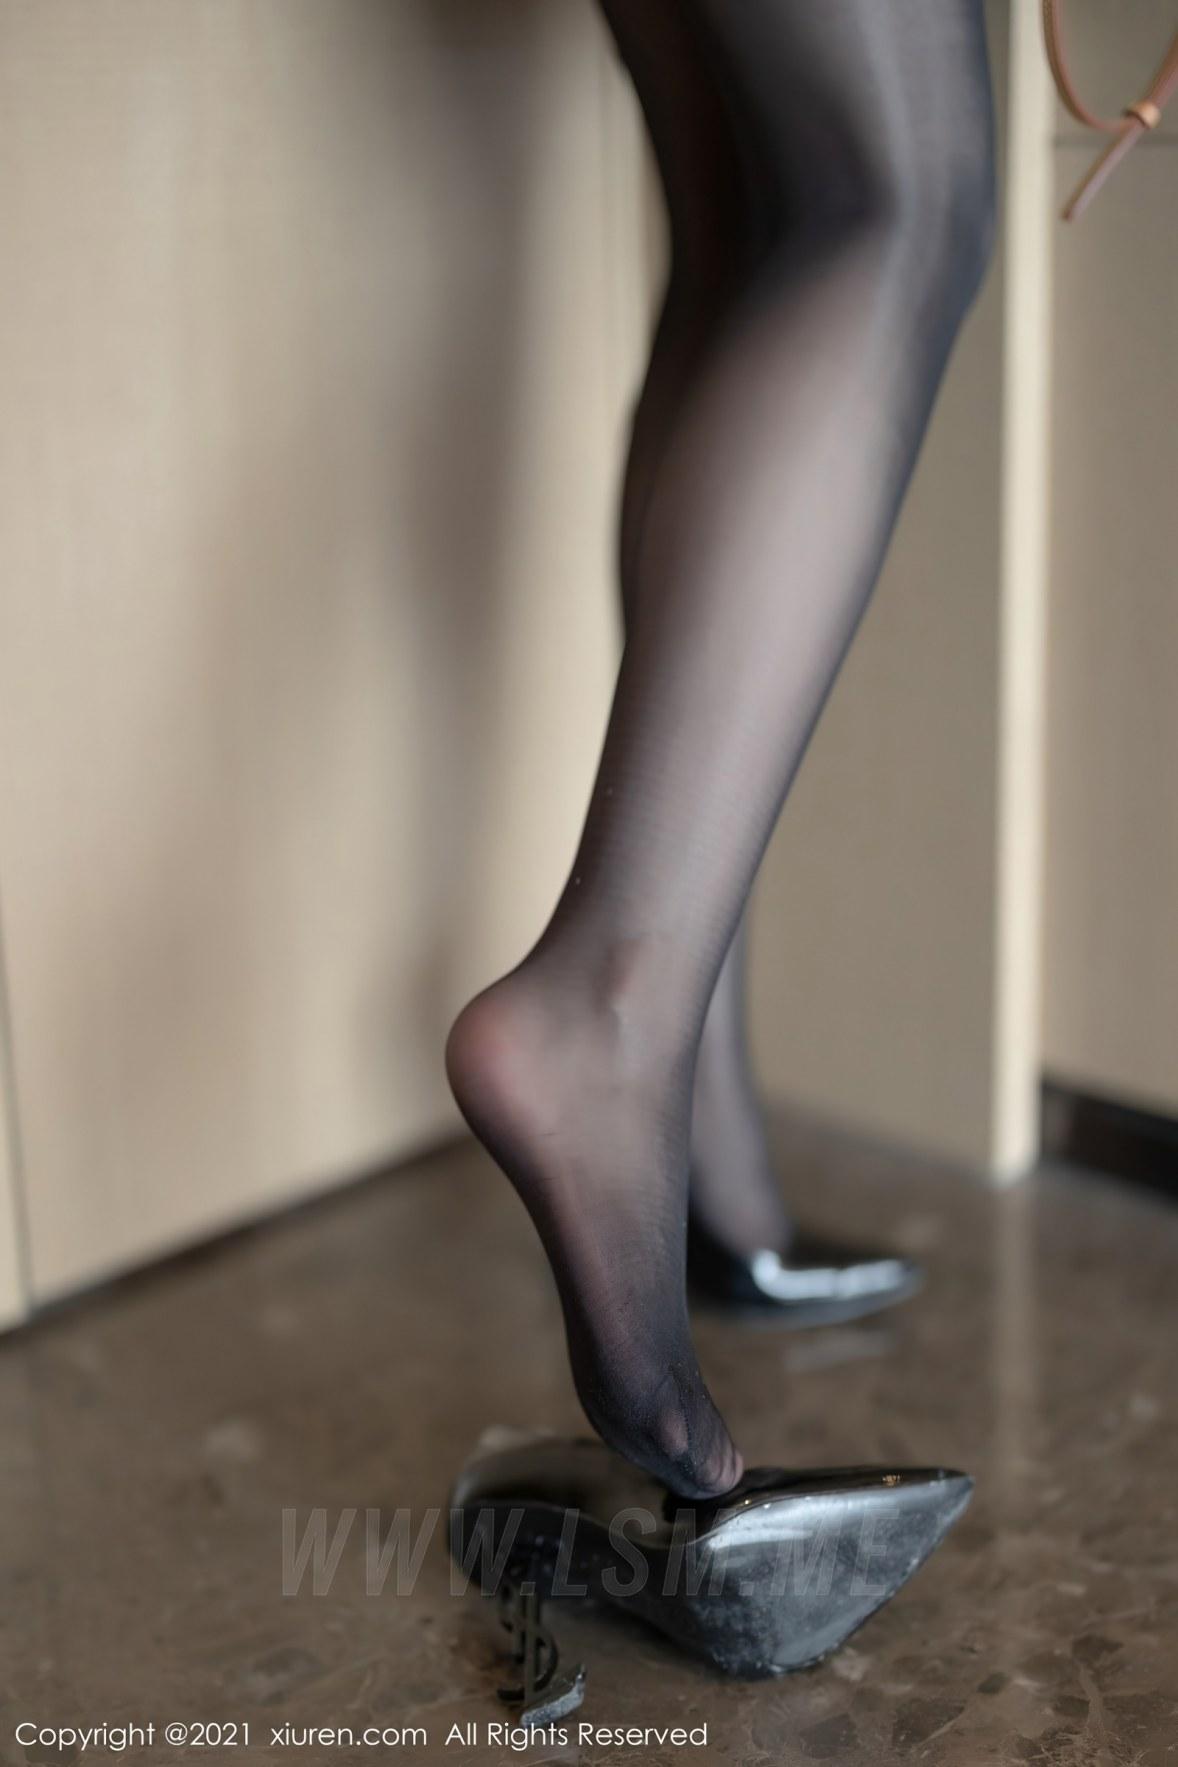 3525 008 aqb 3600 5400 - XiuRen 秀人 No.3525  白衬衫黑短裙OL Cherry绯月樱 江浙沪旅拍写真 - 秀人网 -【免费在线写真】【丽人丝语】